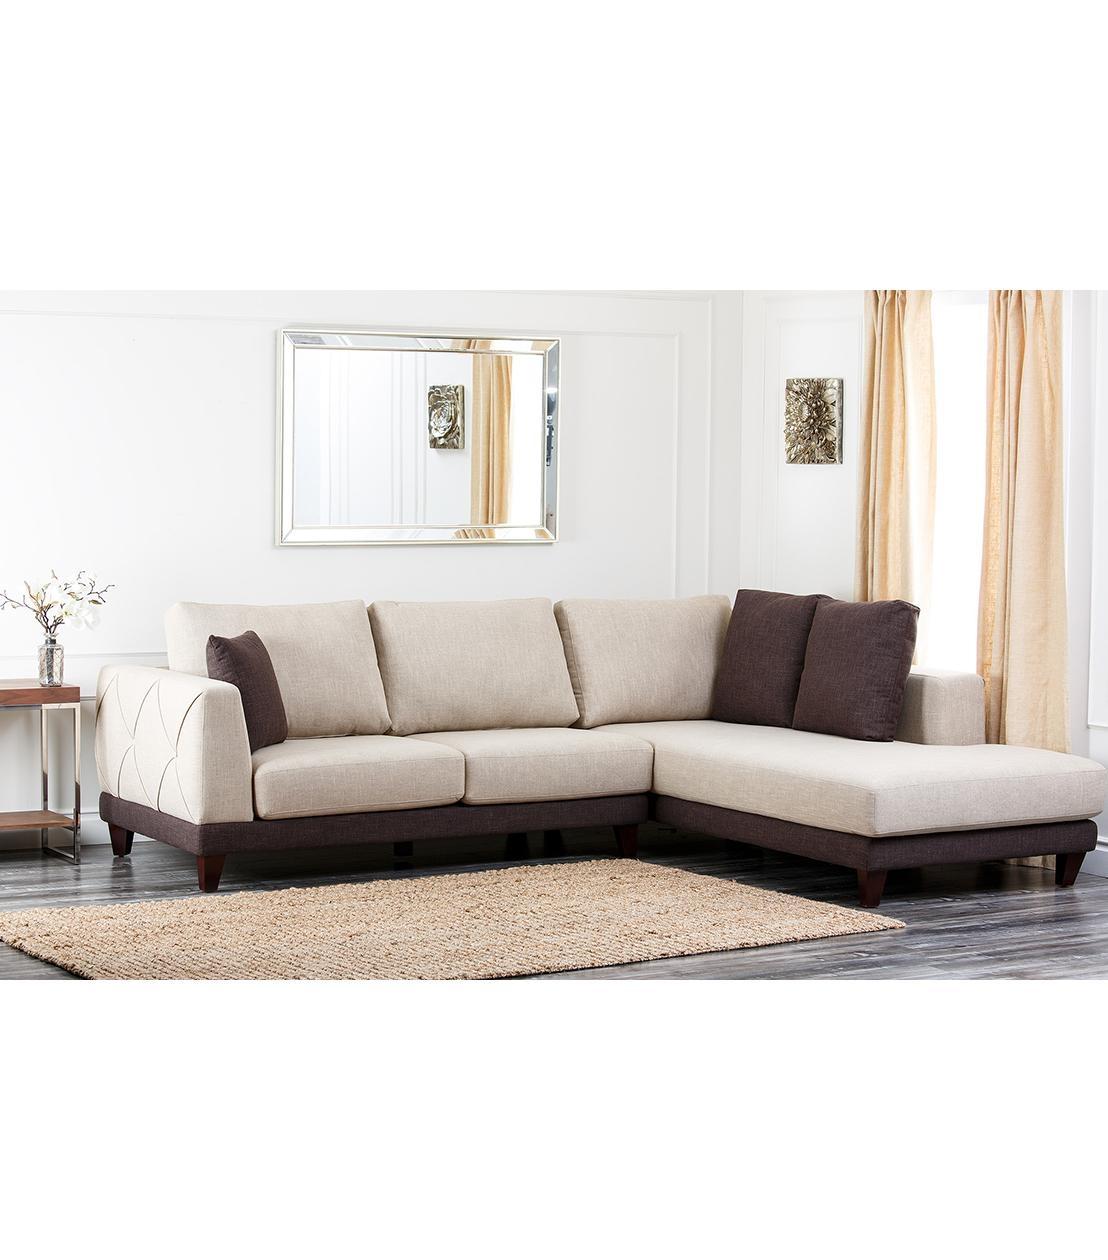 20 best ideas abbyson living sectional sofas sofa ideas for Abbyson living delano sectional sofa and storage ottoman set